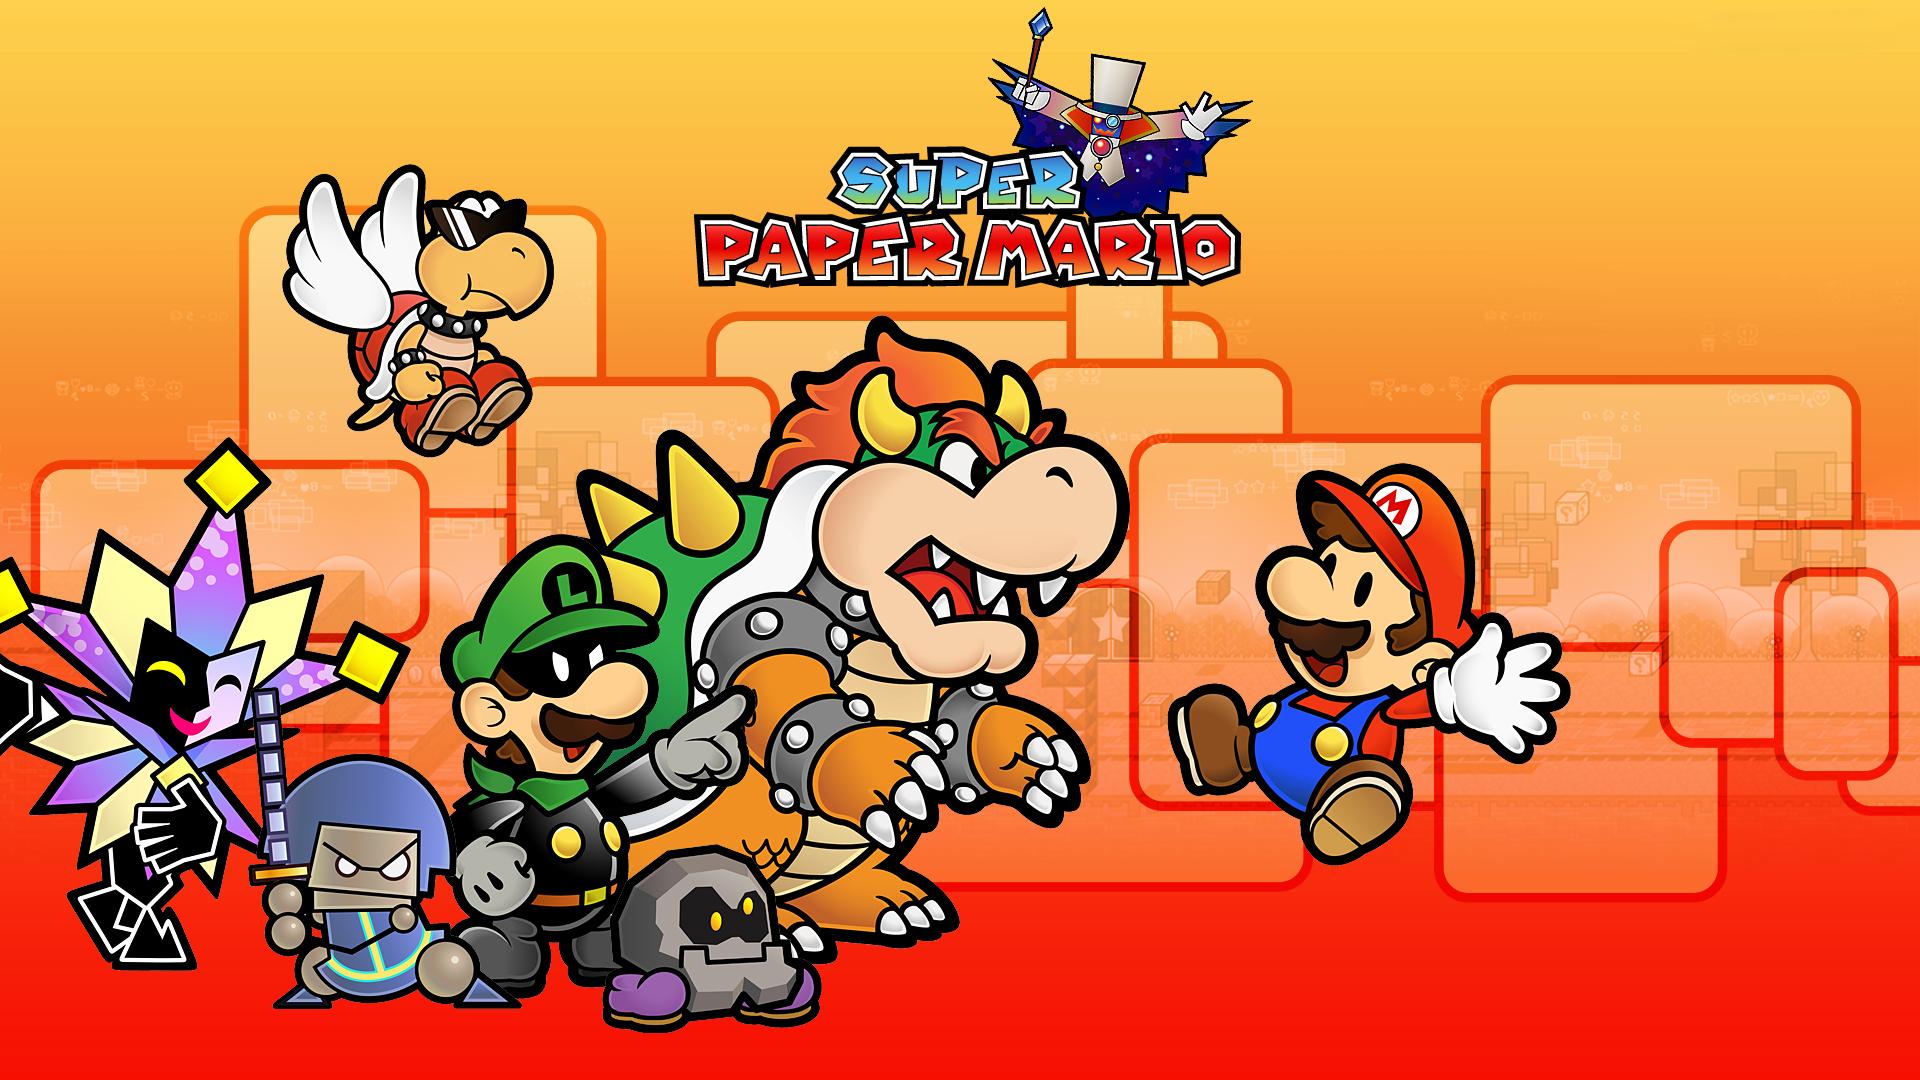 Super Paper Mario Hd Wallpaper Background Image 1920x1080 Id